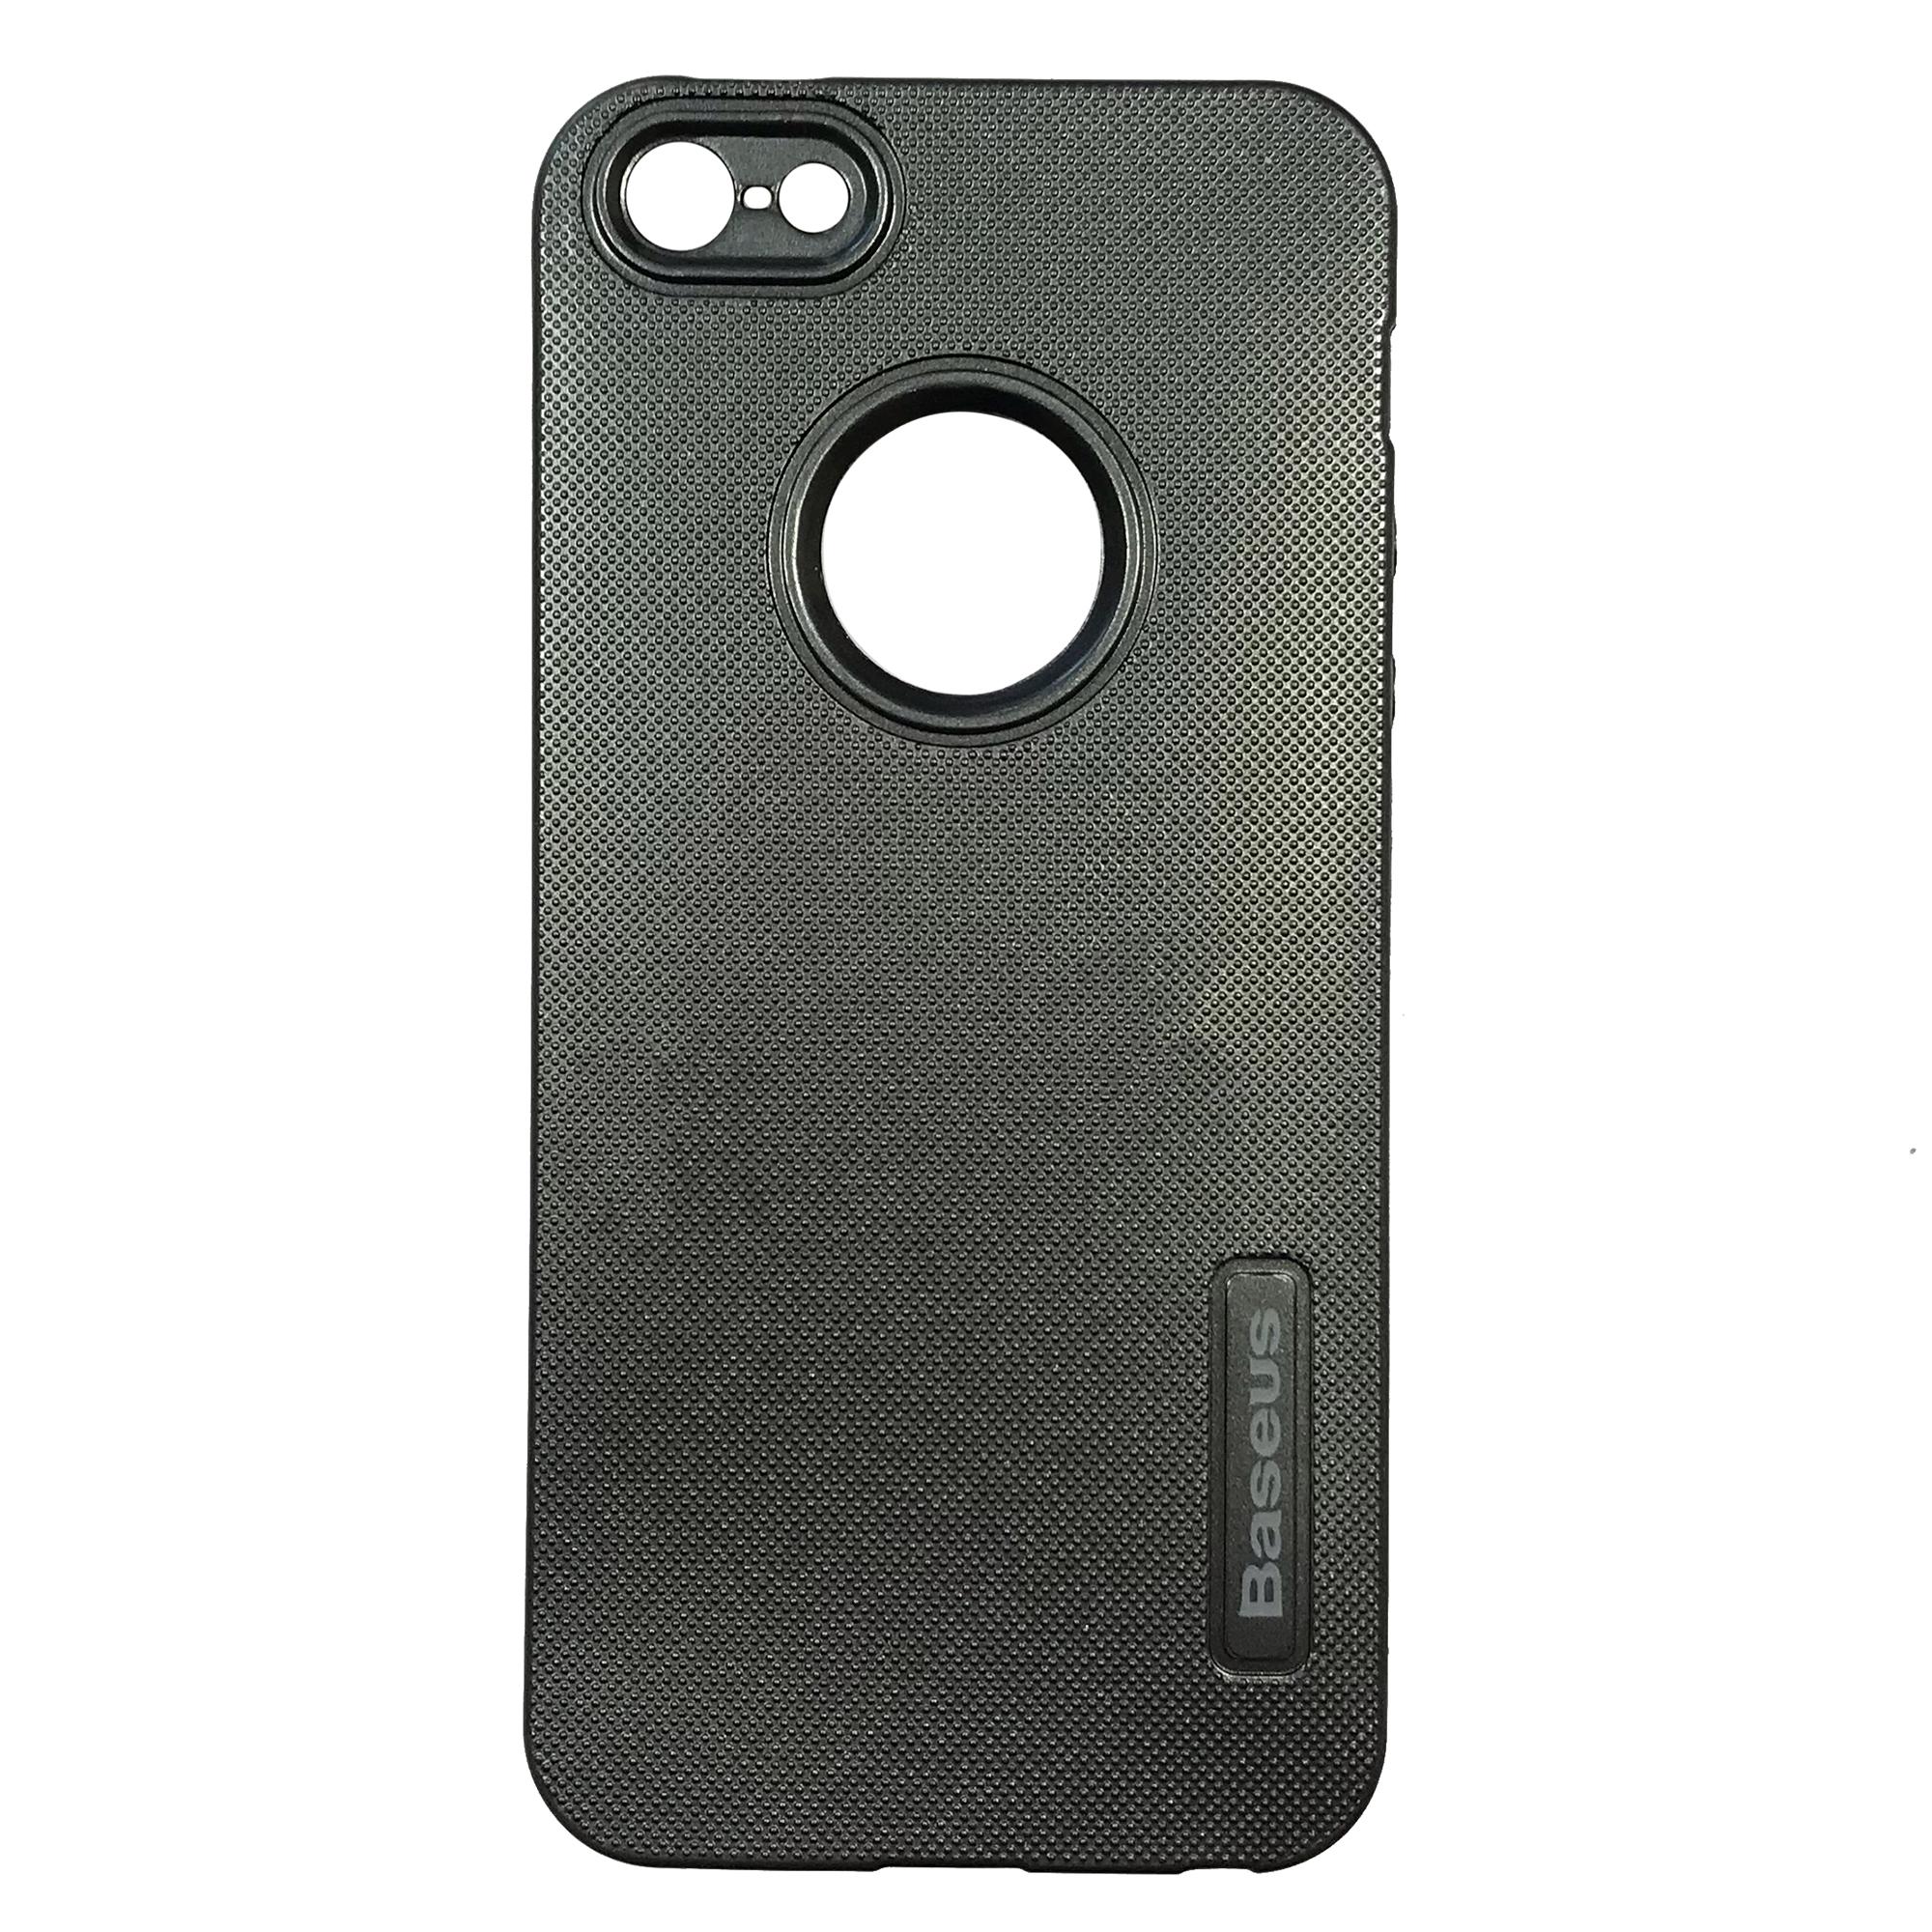 کاور مدل BS مناسب برای گوشی موبایل  اپل iphone 5/5S/SE